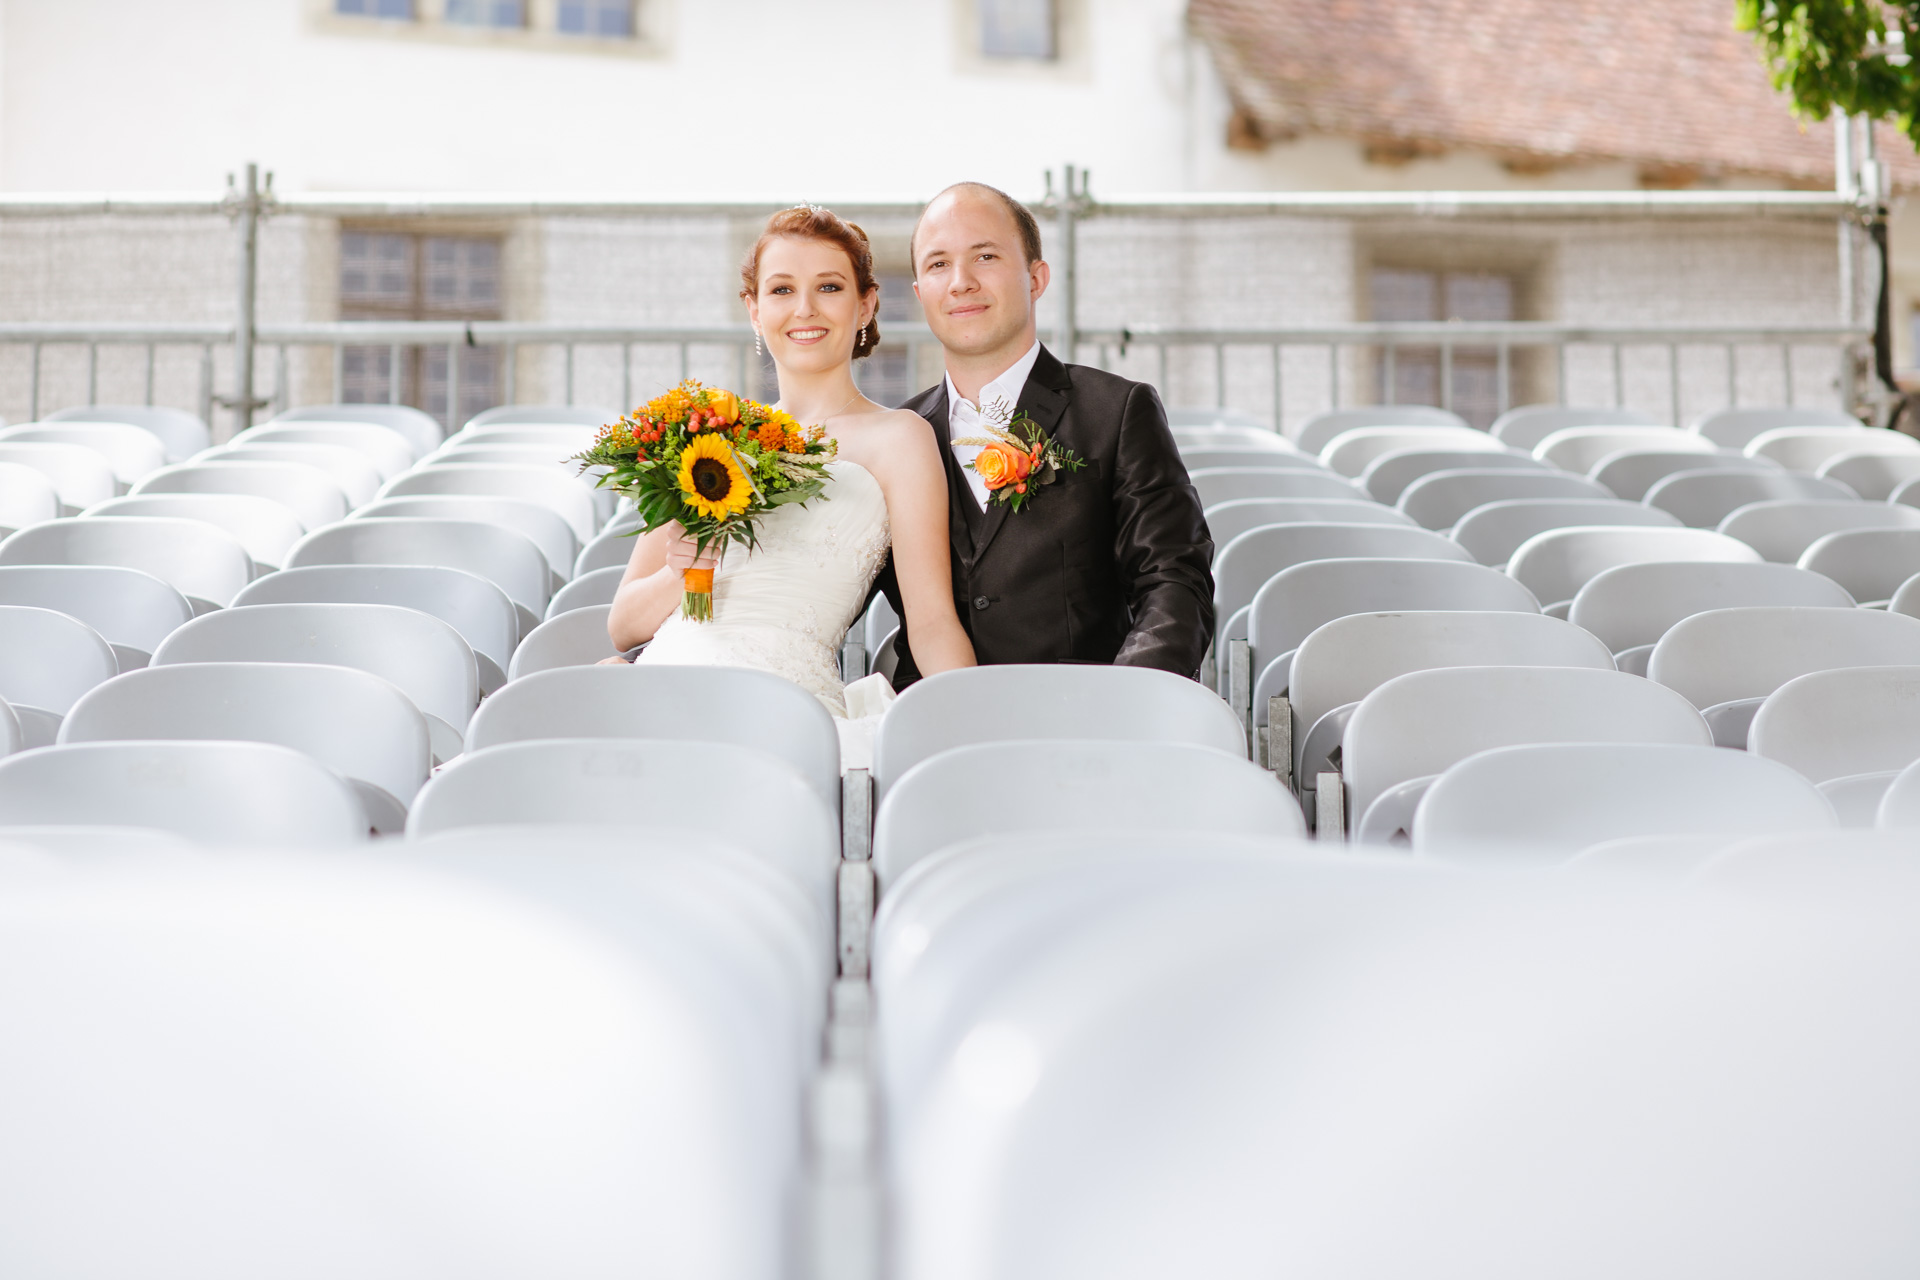 Pixelart_Hochzeitsfotografen_Loerrach_Rheinfelden_Hallwil_Schweiz_Linda-Ramon-1009